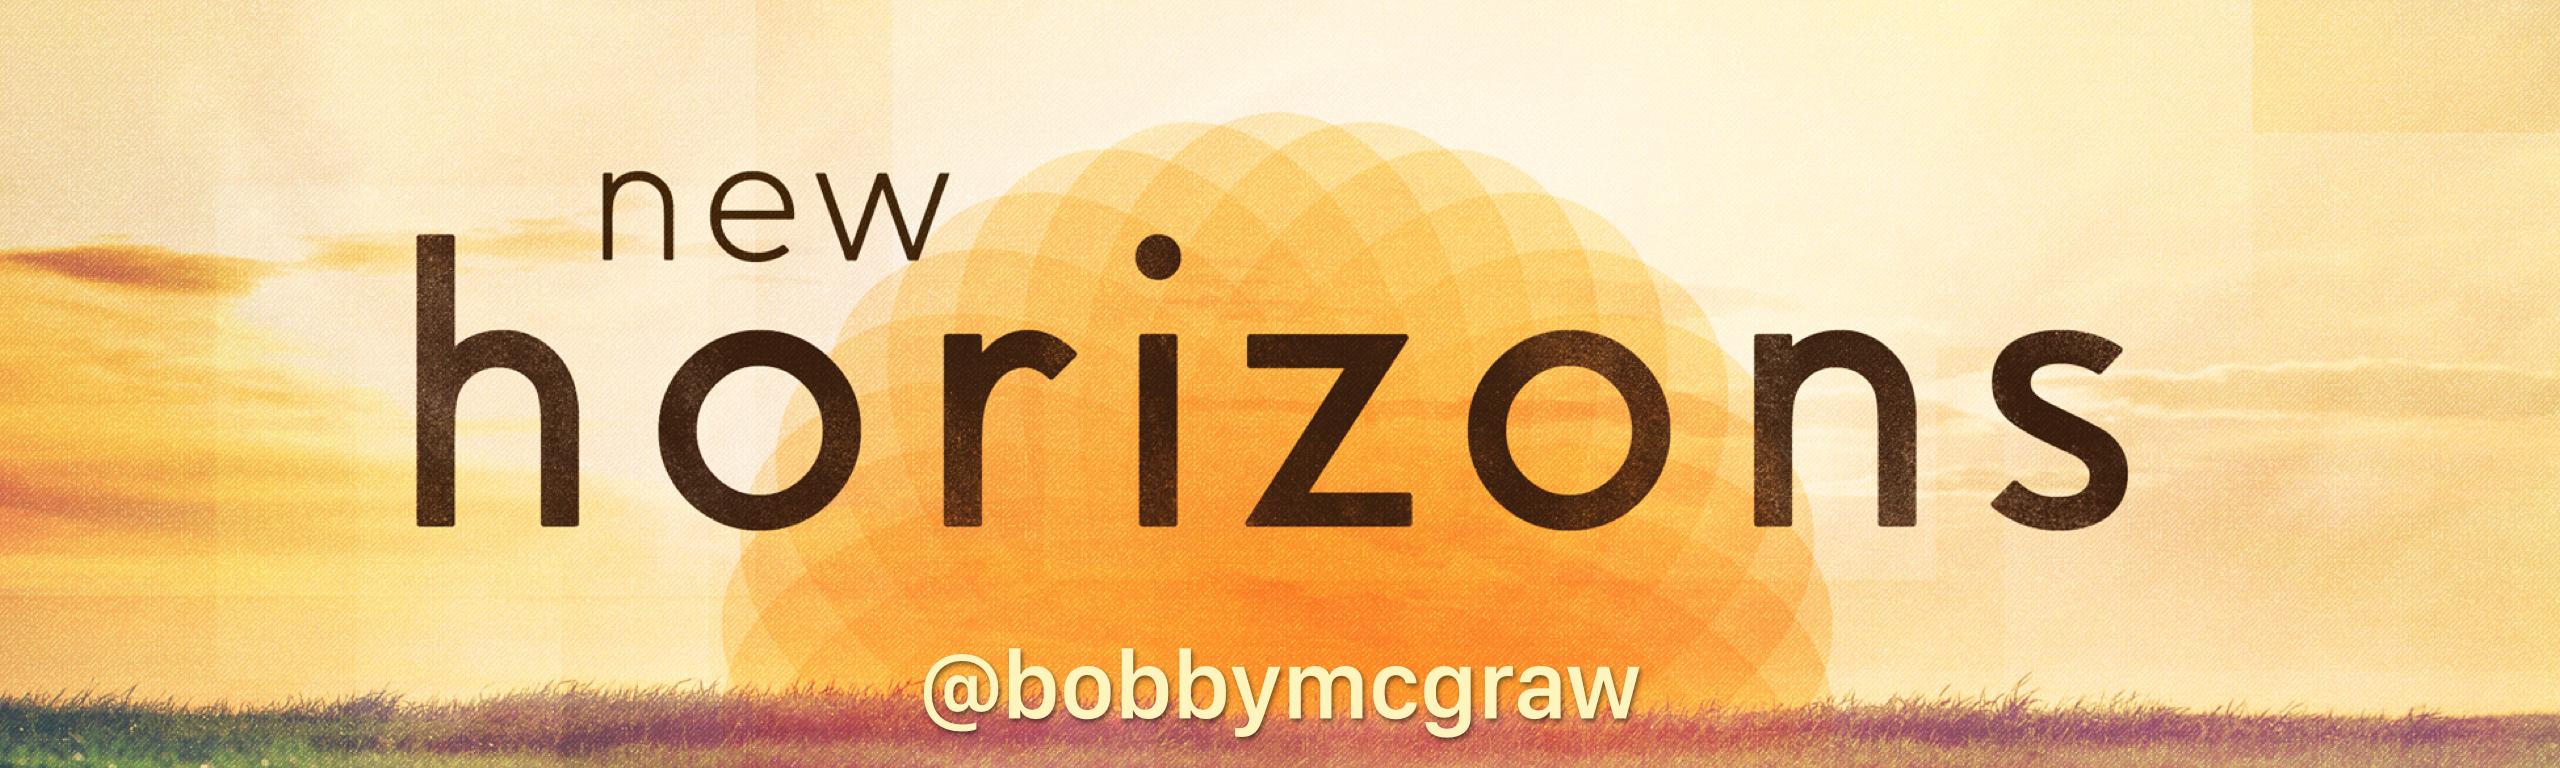 New Horizon - Center Screen JPGS.001